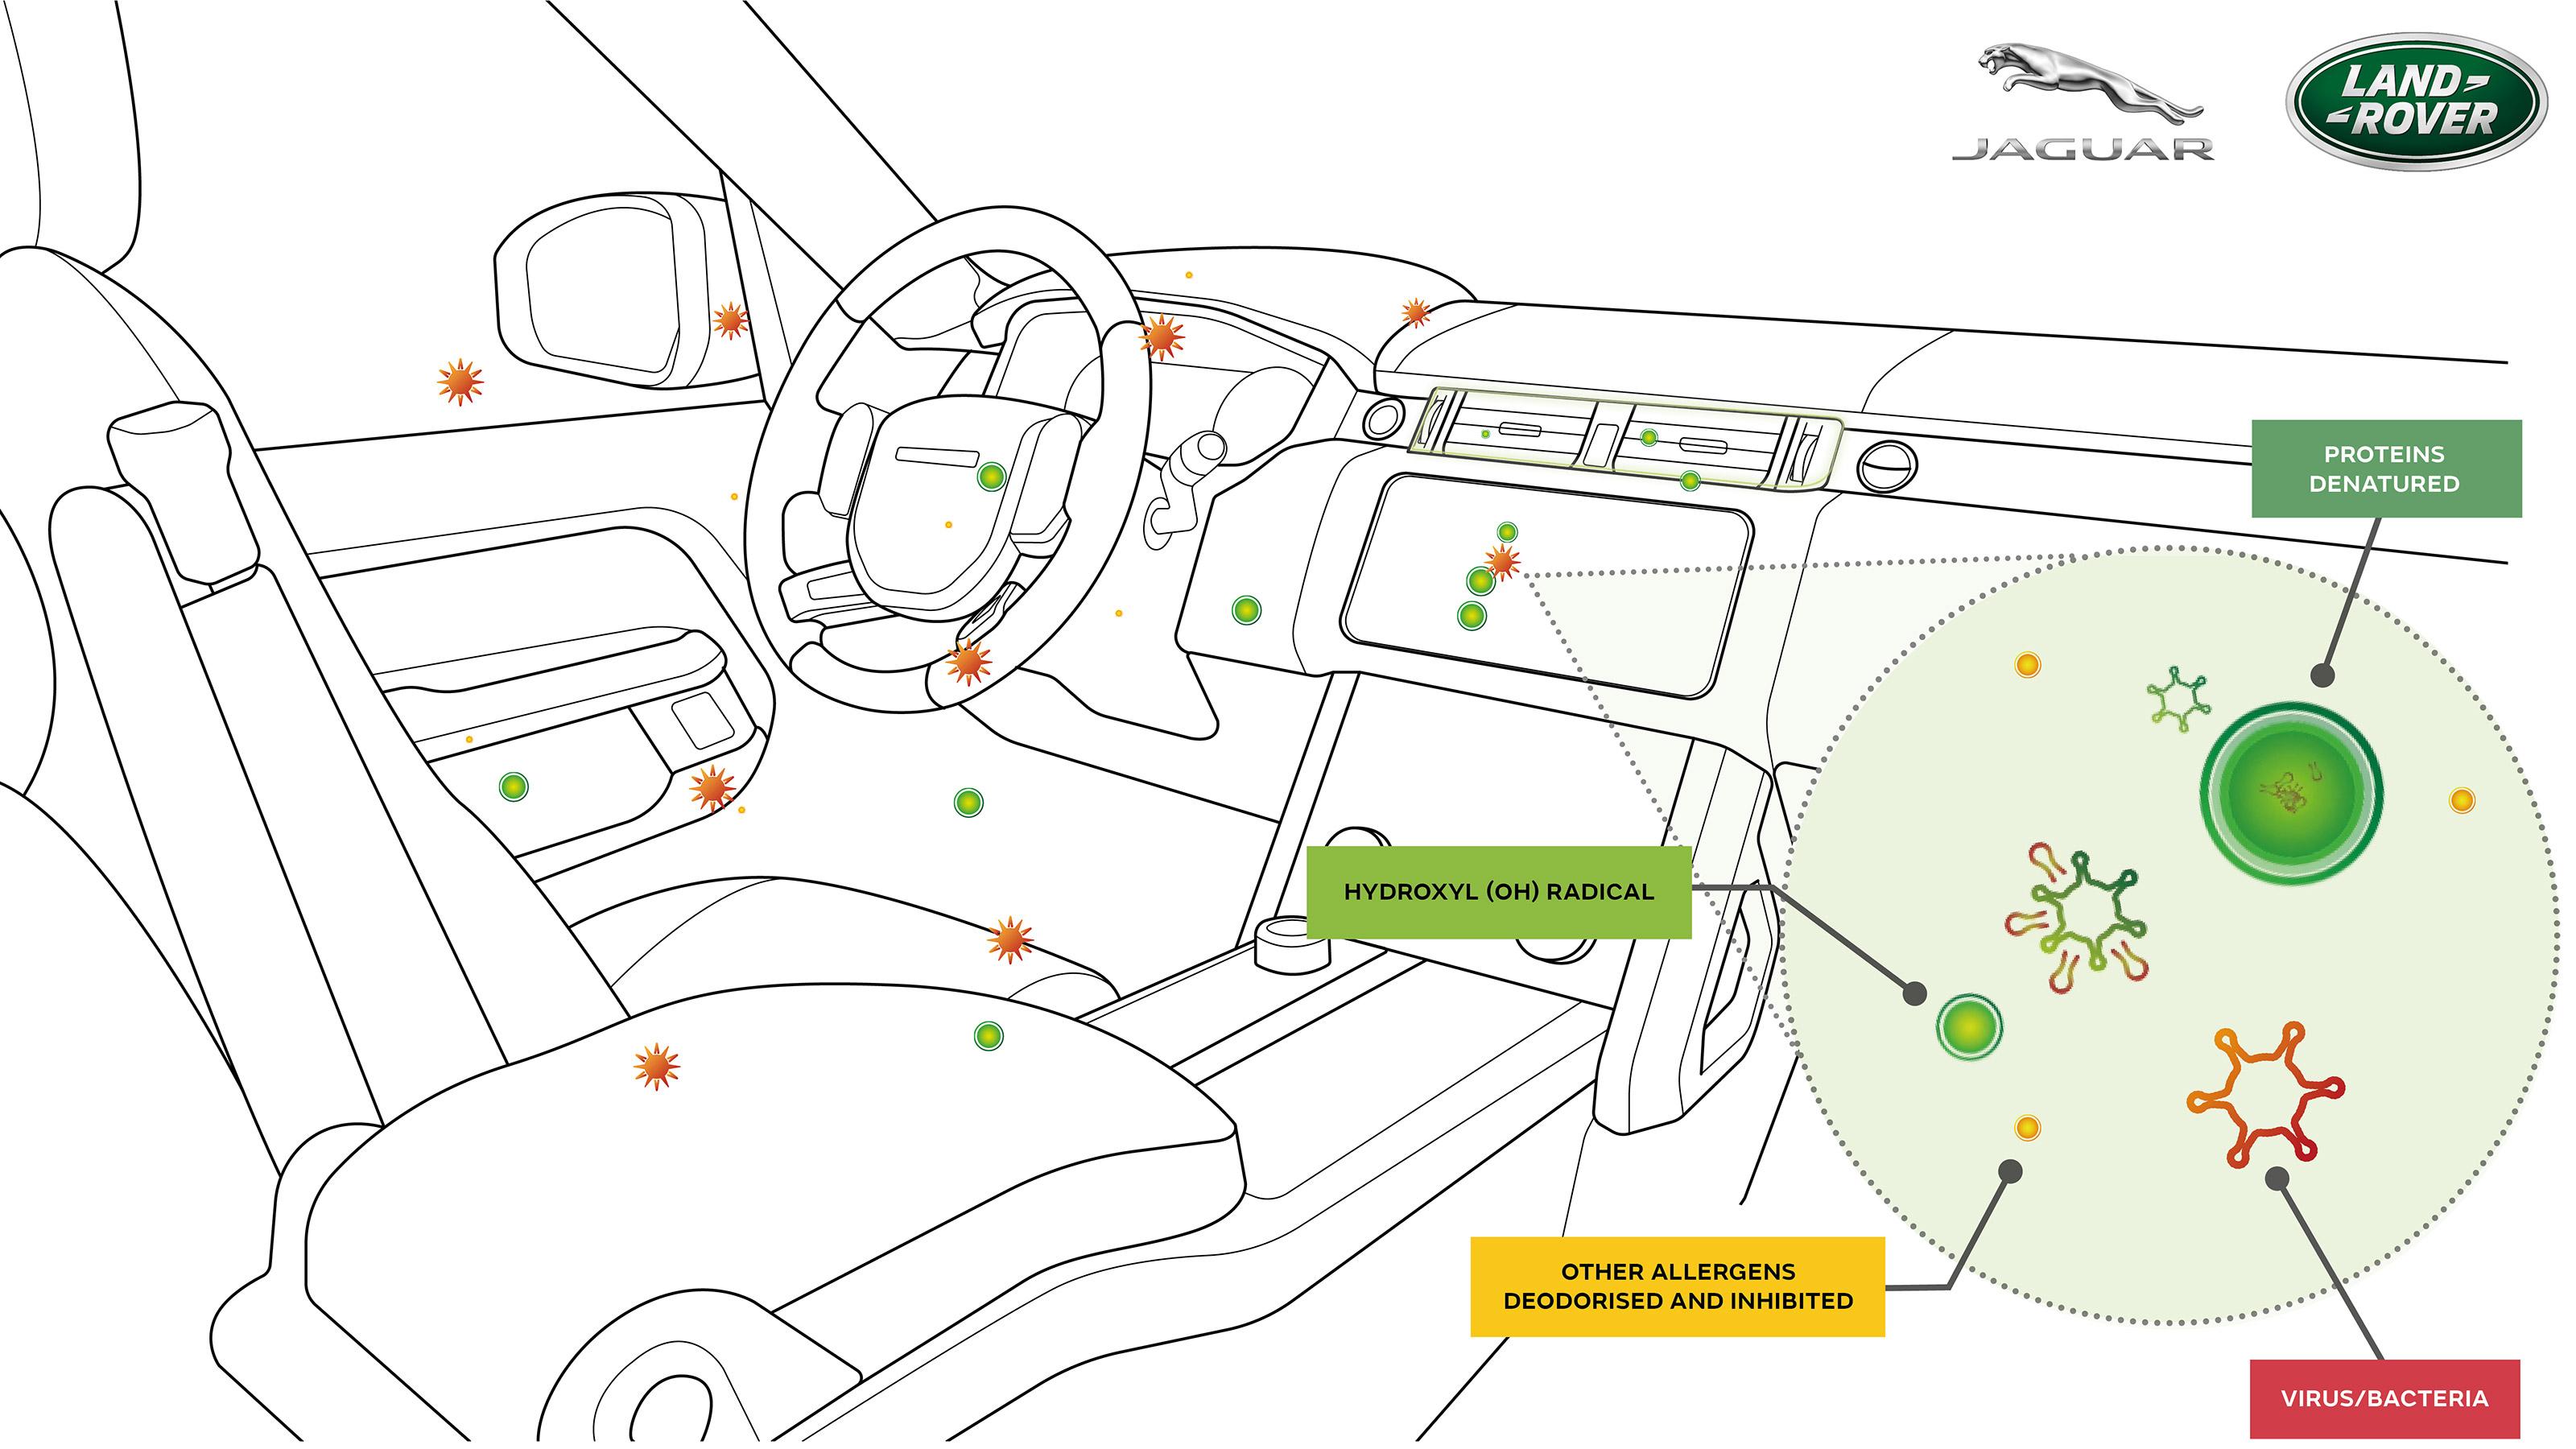 Jaguar Land Rover reveals prototype Covid-inhibiting cabin ...